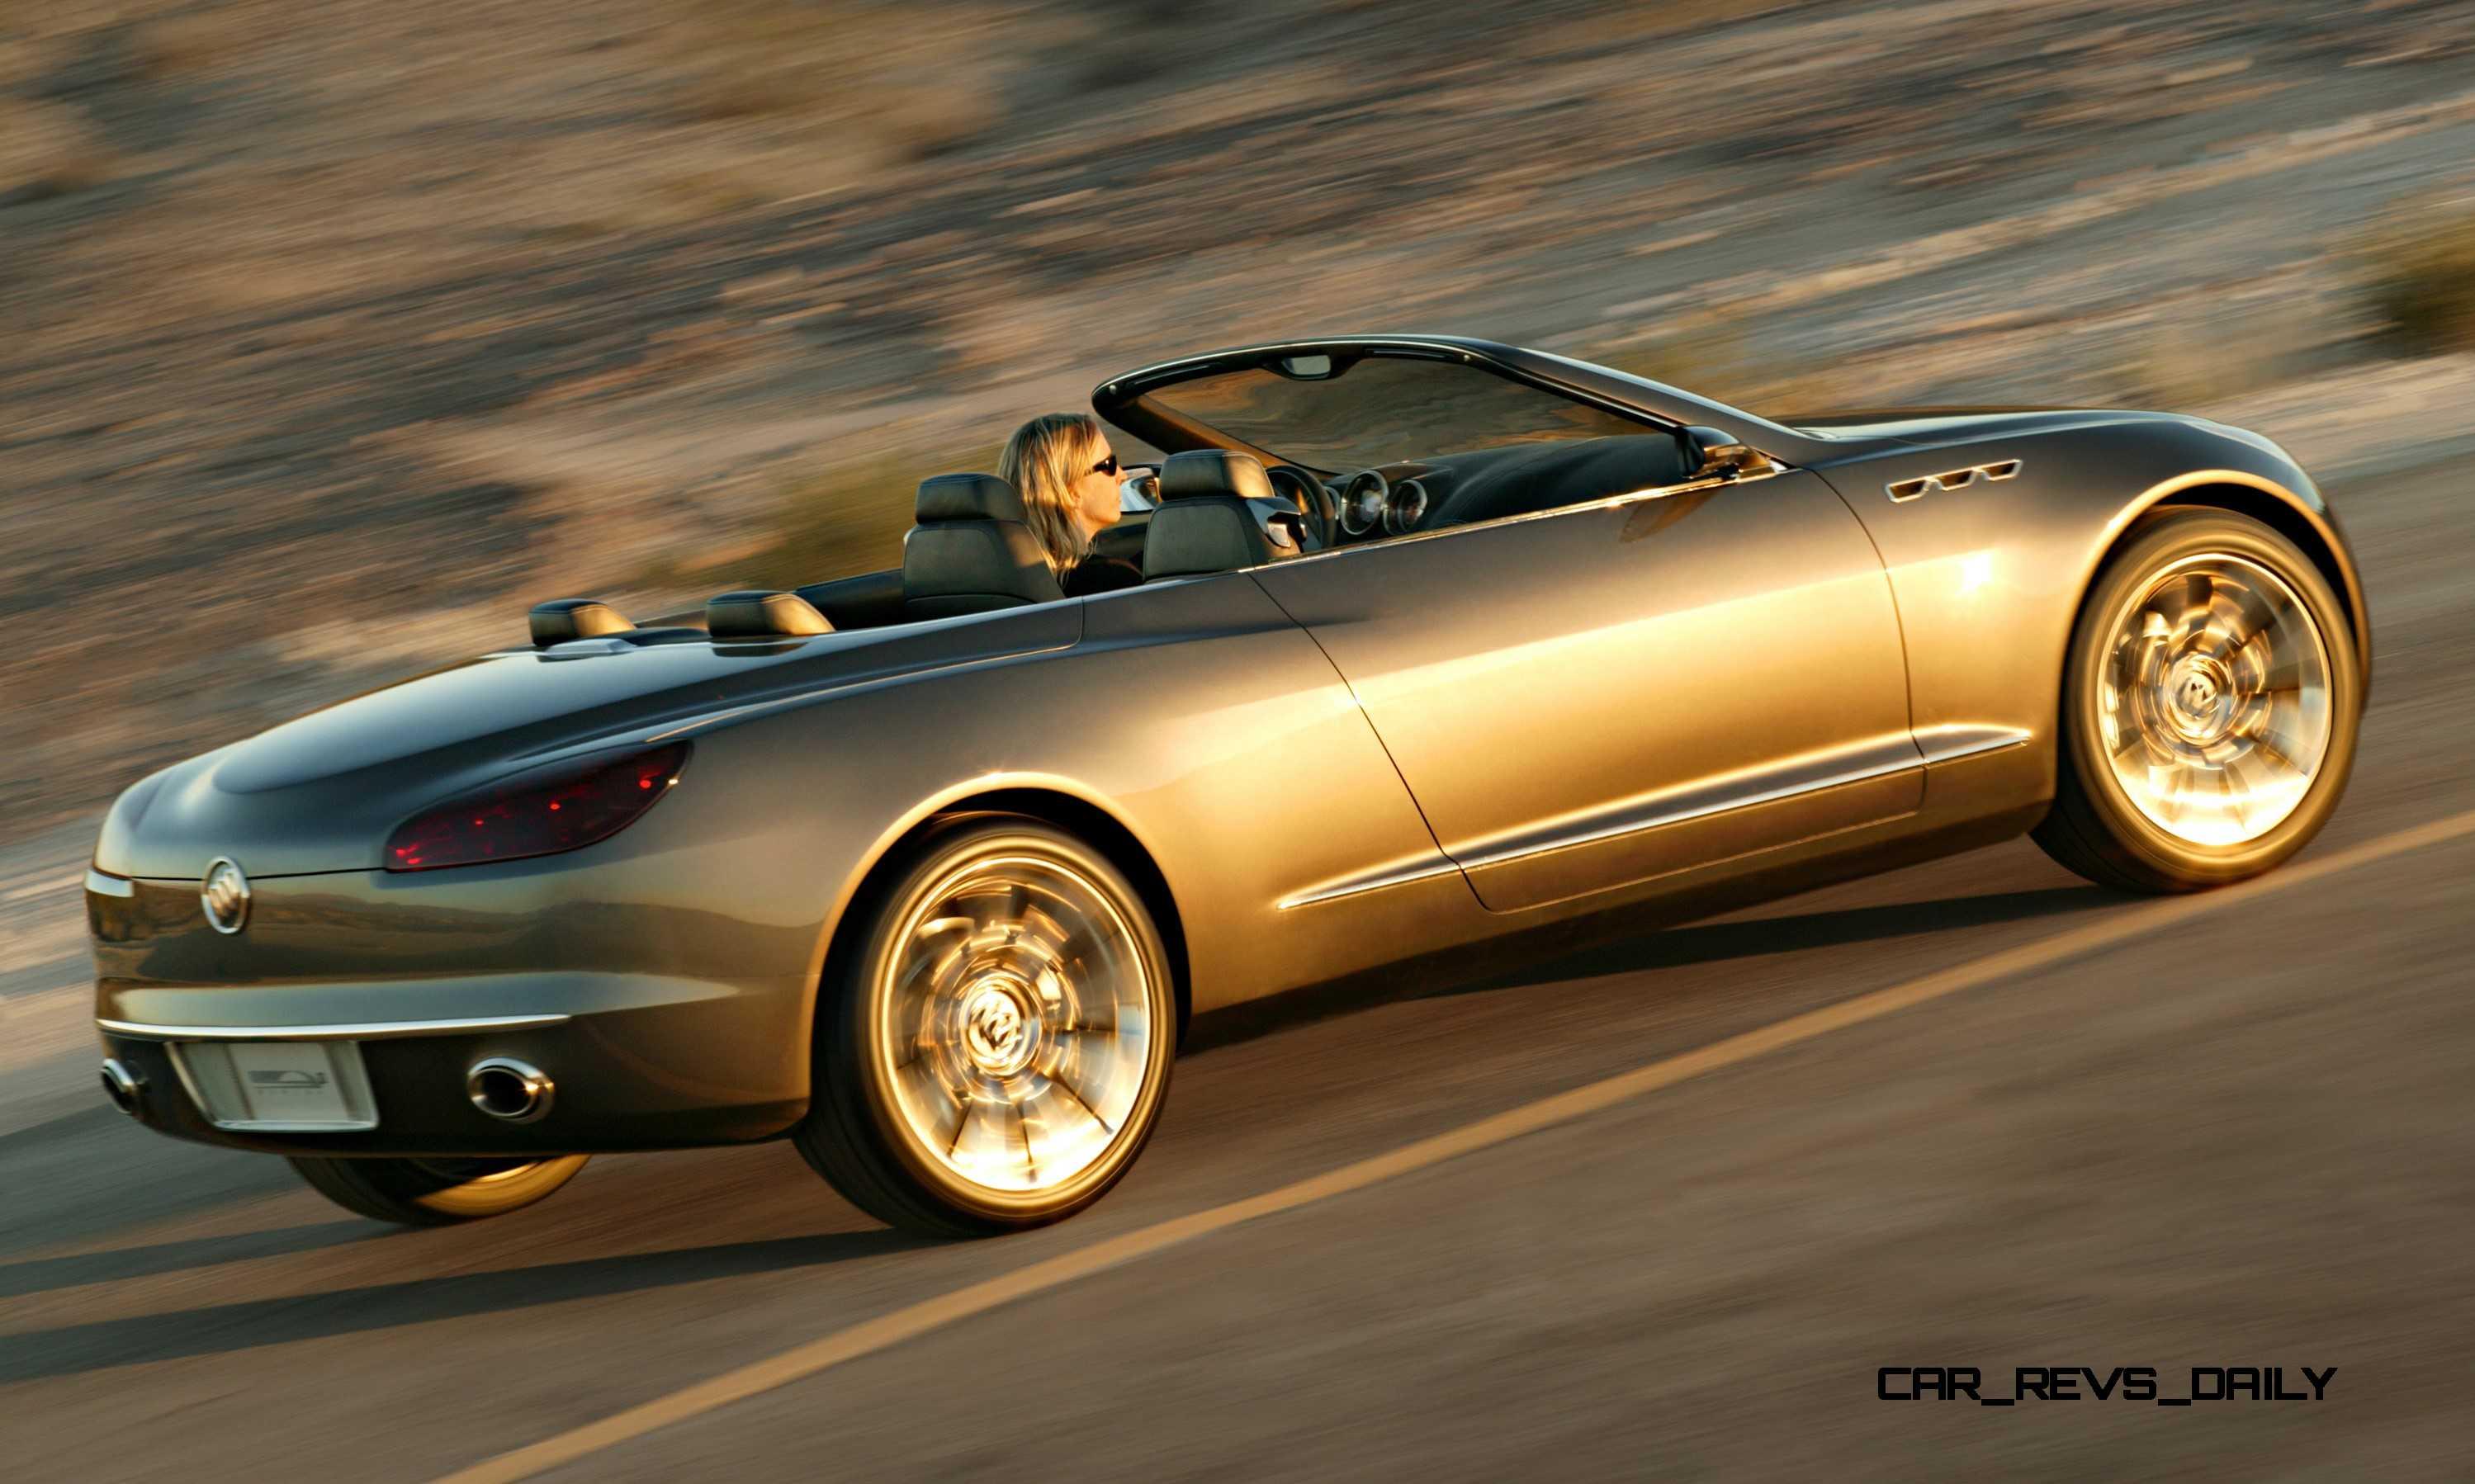 http://www.car-revs-daily.com/wp-content/uploads/2014/12/2004-Buick-Velite-15.jpg